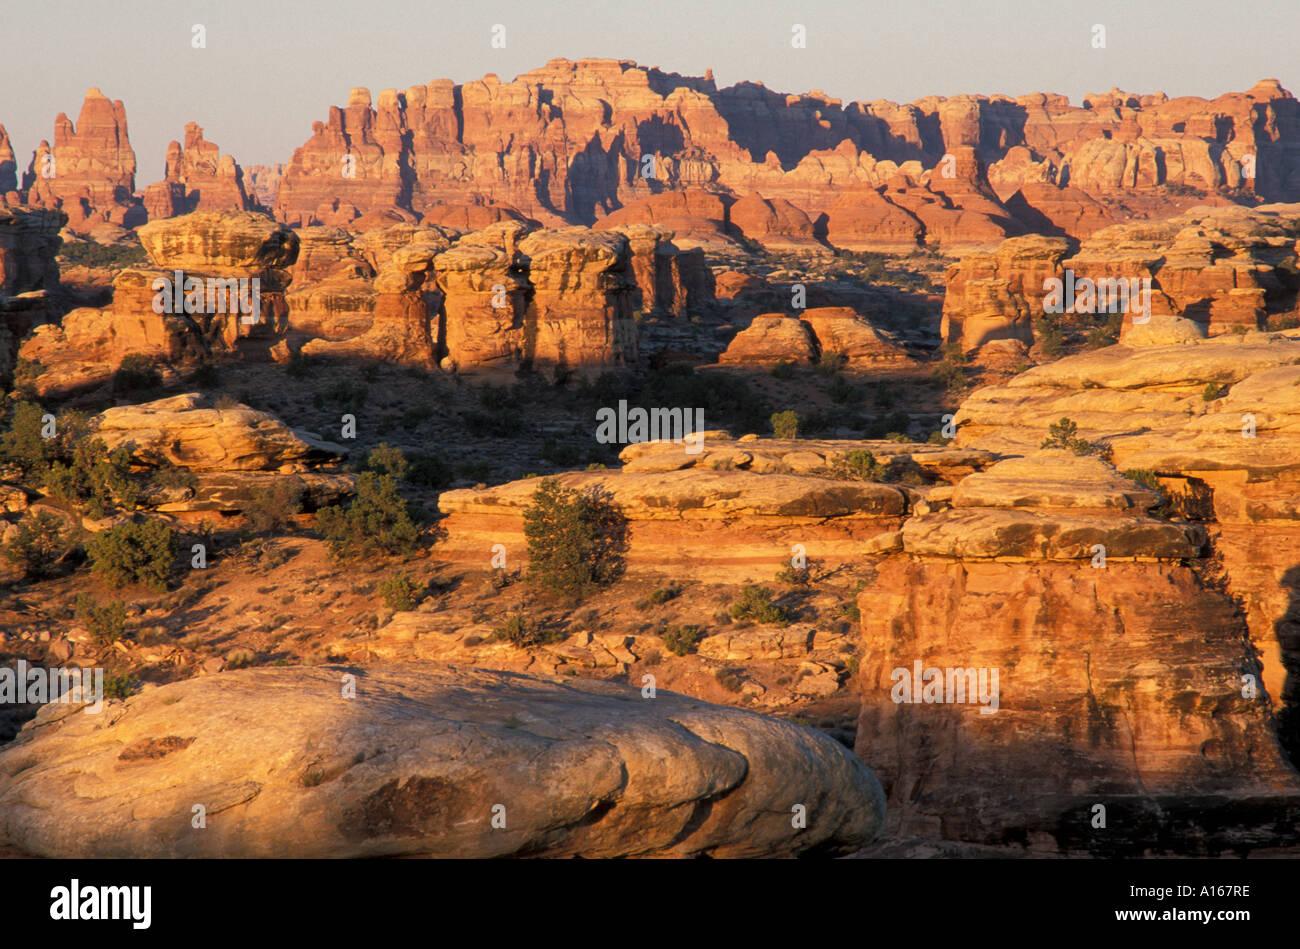 Canyonlands national park needles district